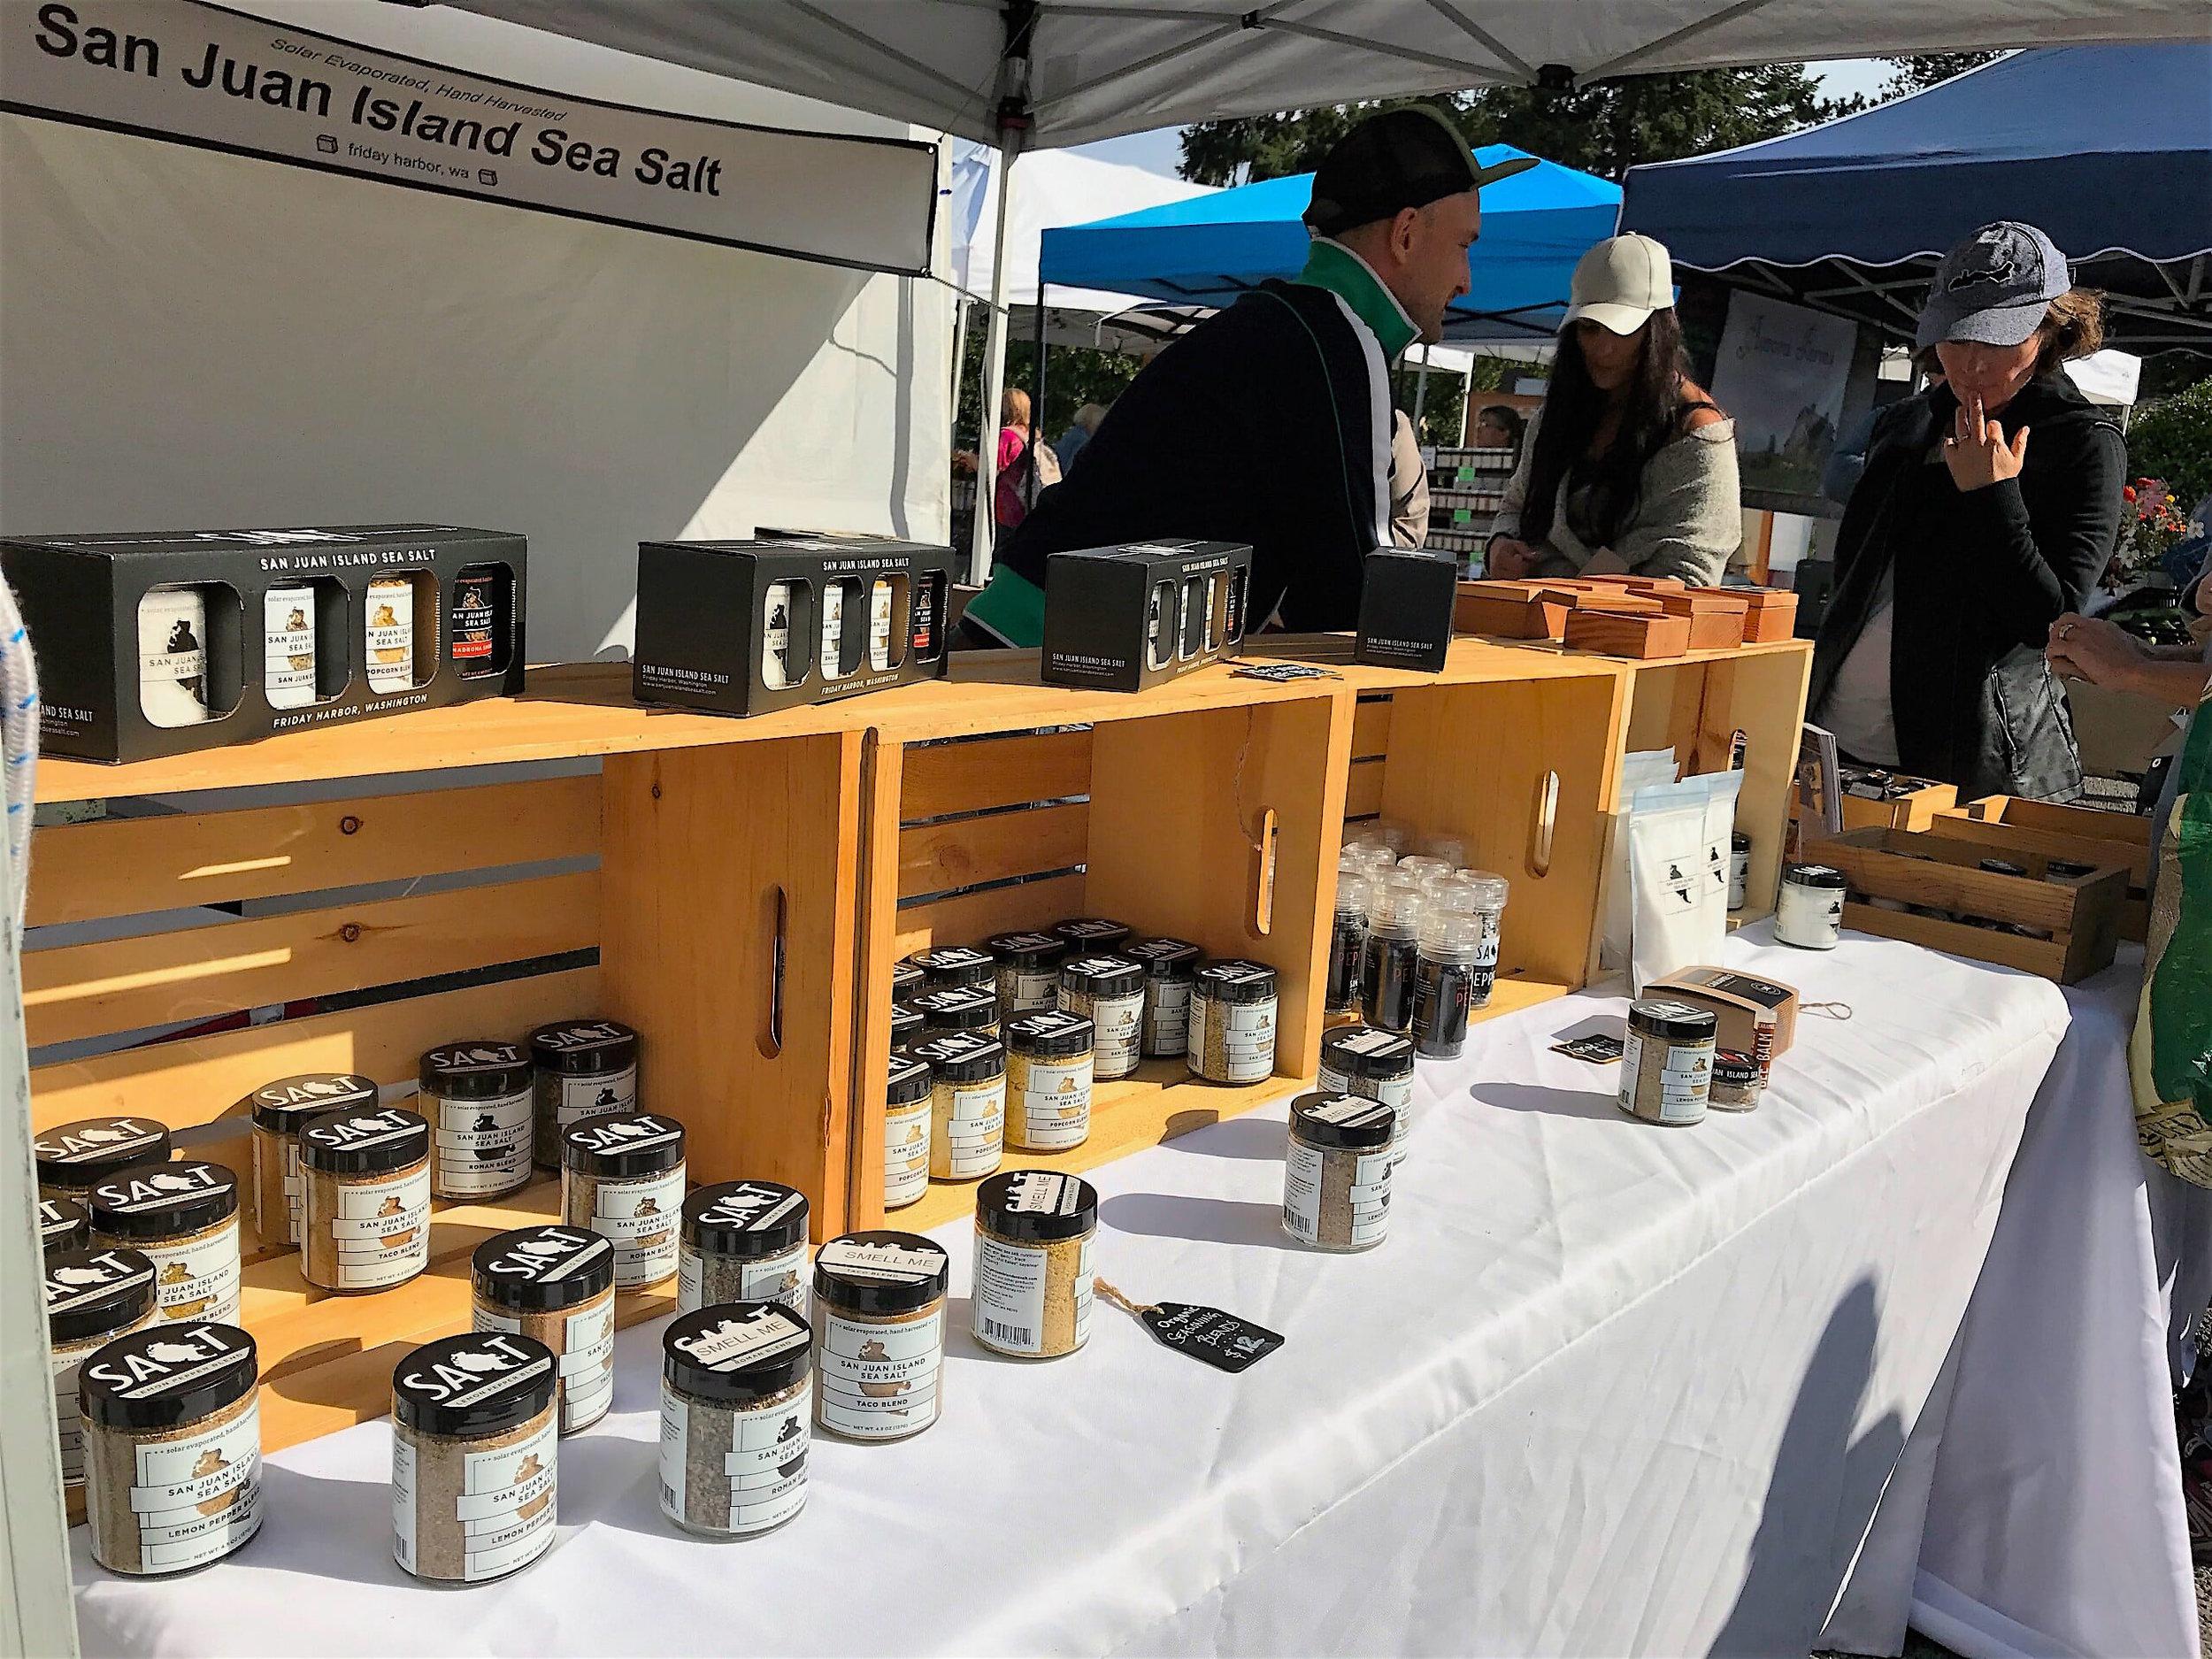 San Juan Island Sea Salt's booth at the Saturday Farmer's Market